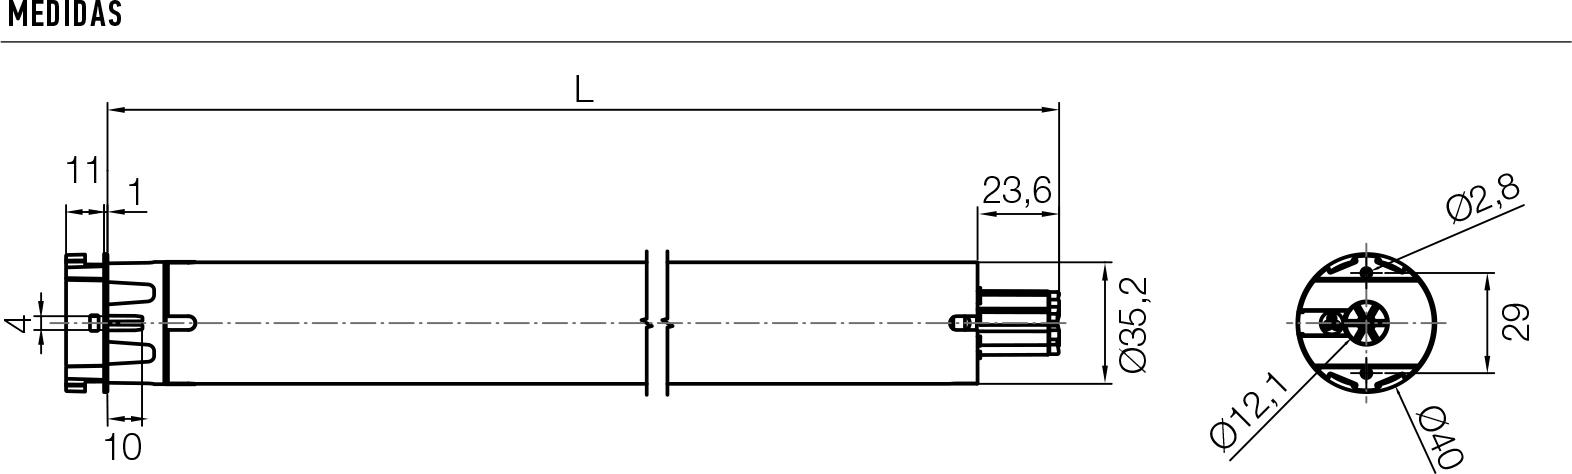 caracteristicas-era-mat-st-2